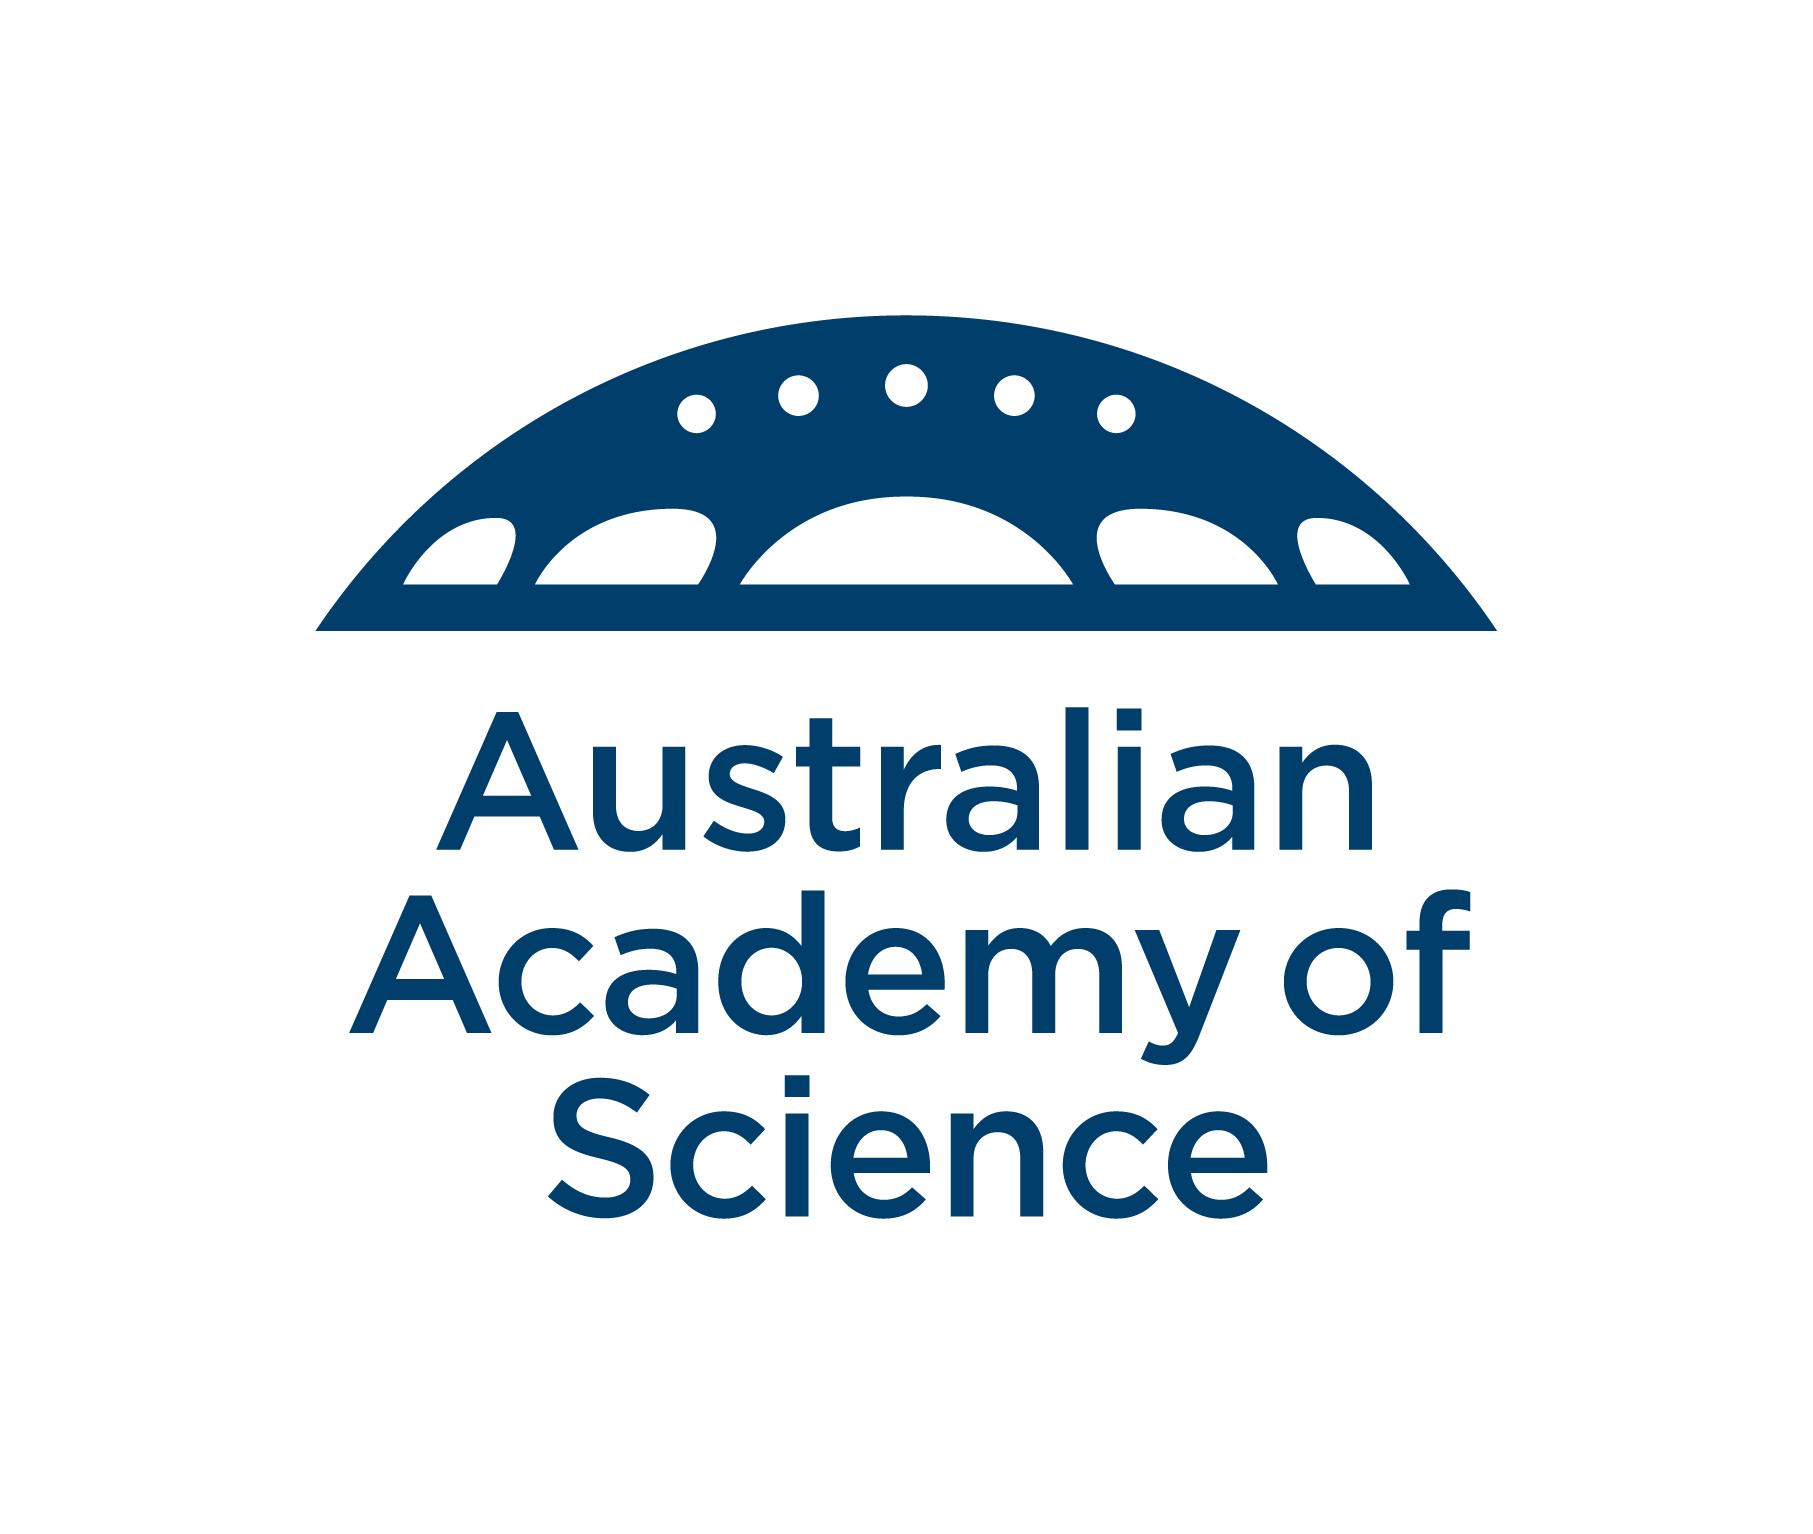 Australian Academy of Science (logo)